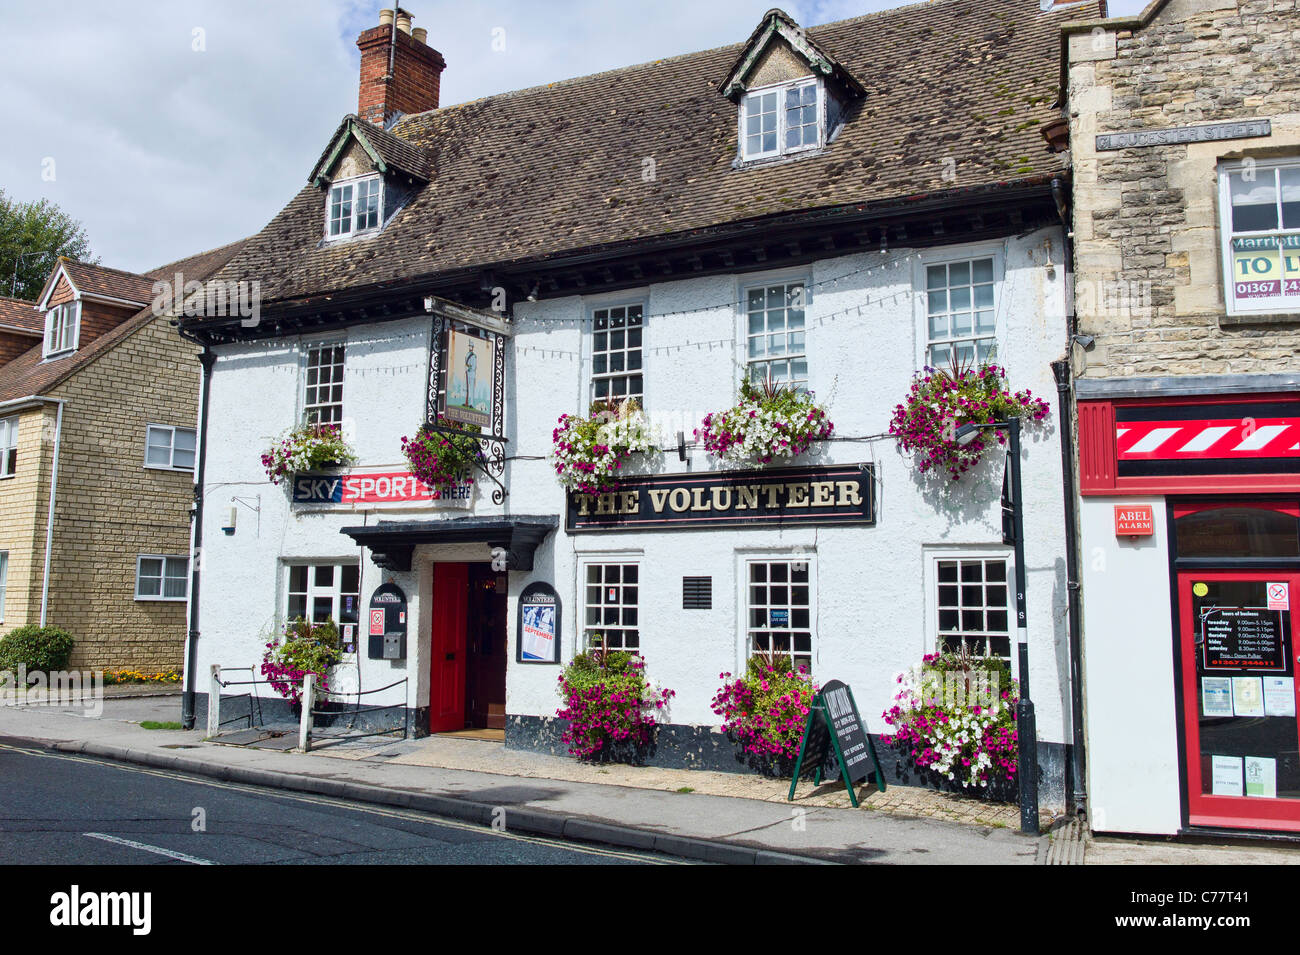 The Volunteer inn in Faringdon Oxfordshire England UK - Stock Image